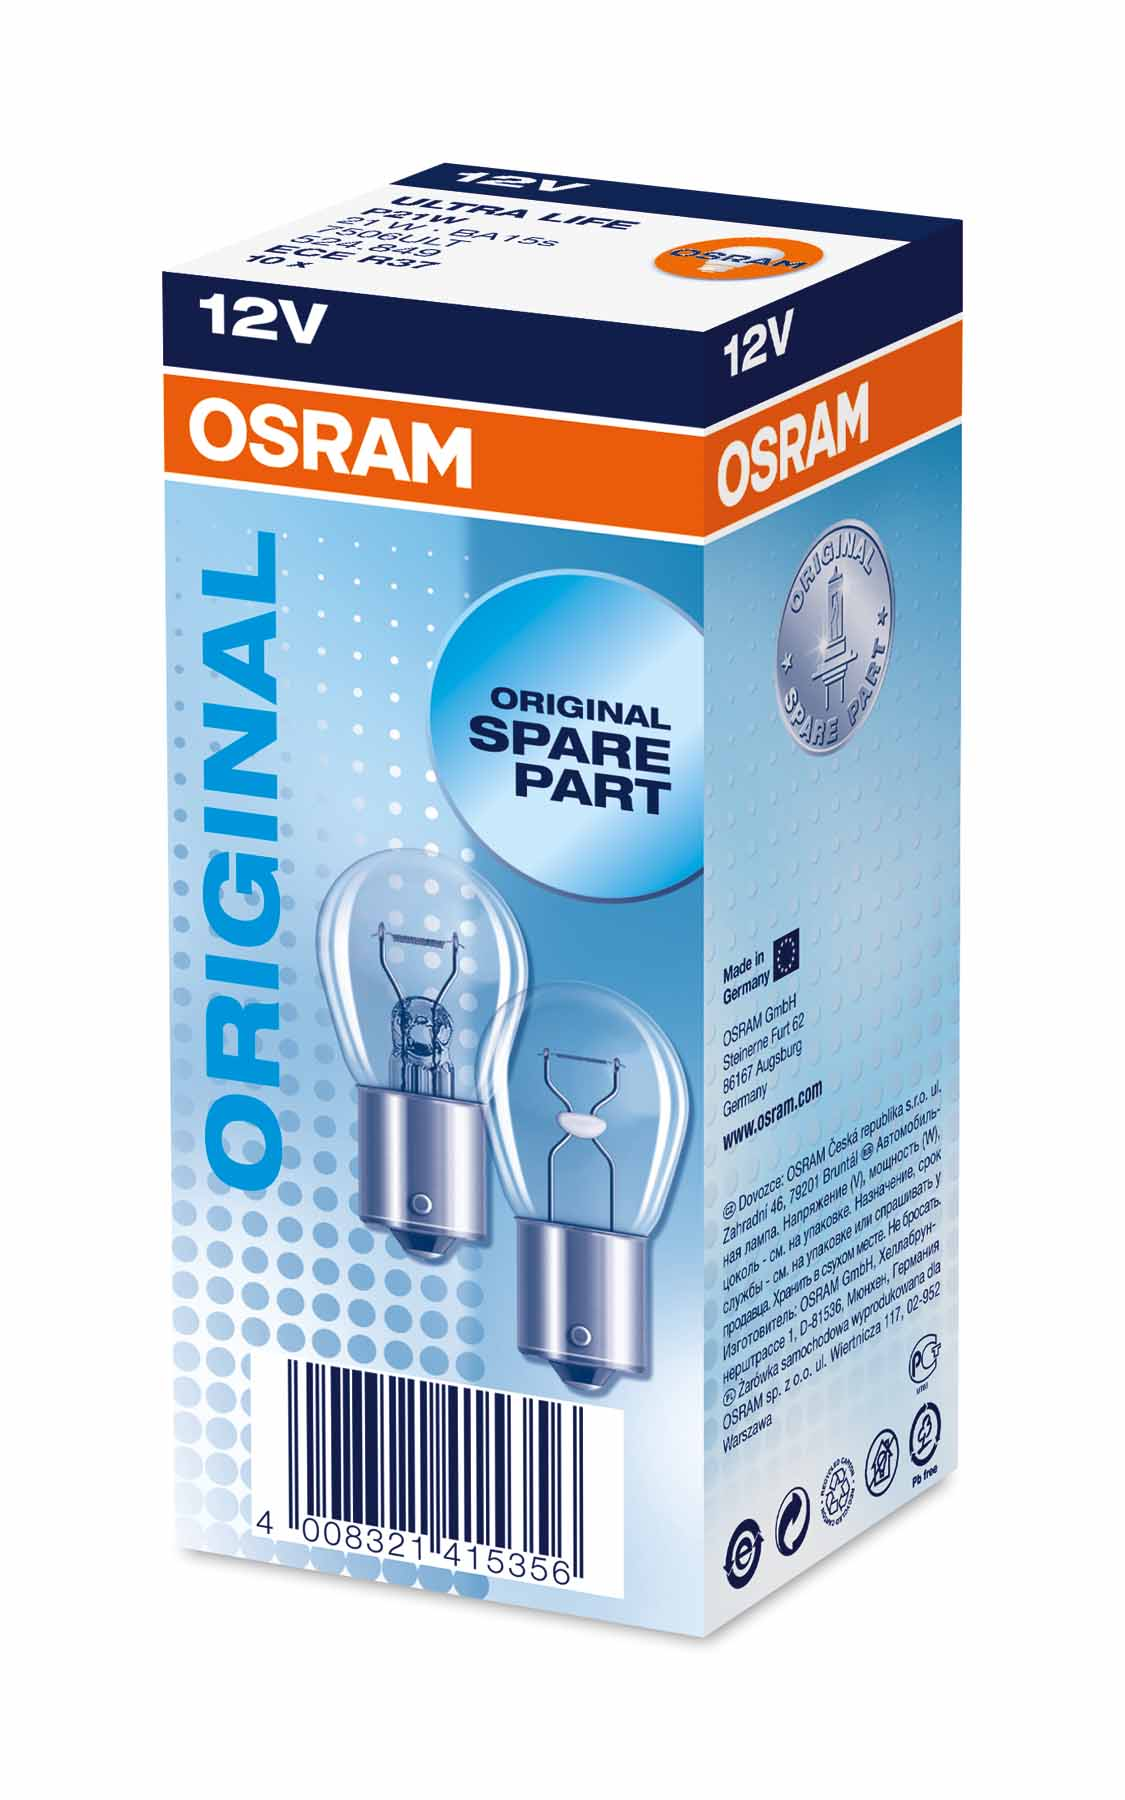 Ampoule P21W Ultra Life 21W [12V] (2 pièces) | OSRAM